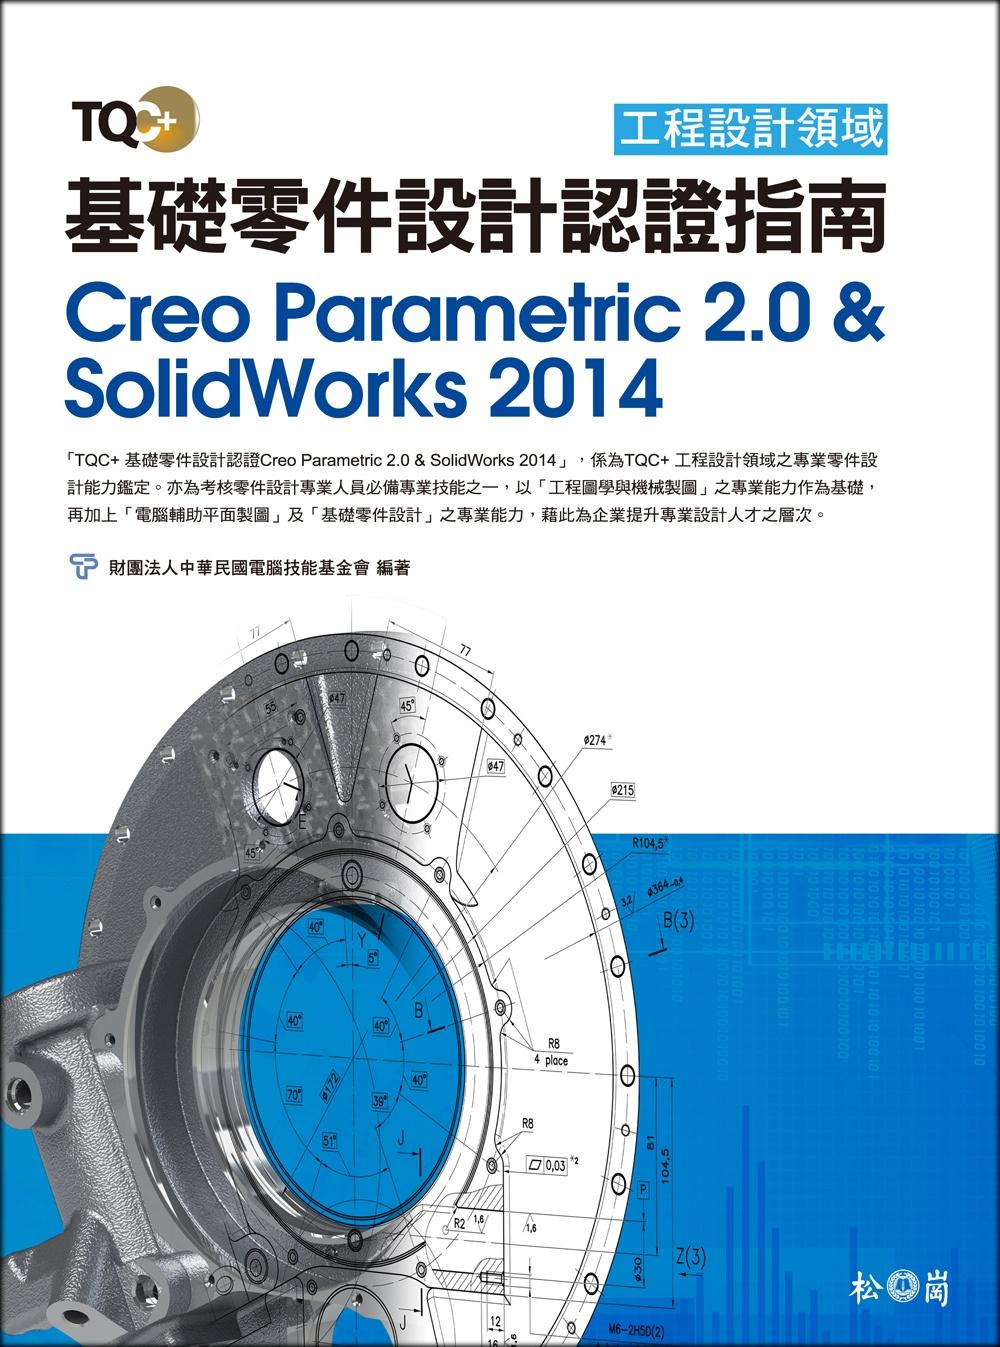 TQC+ 基礎零件設計認證指南 Creo Parametric 2.0 & SolidWorks 2014(附CD)